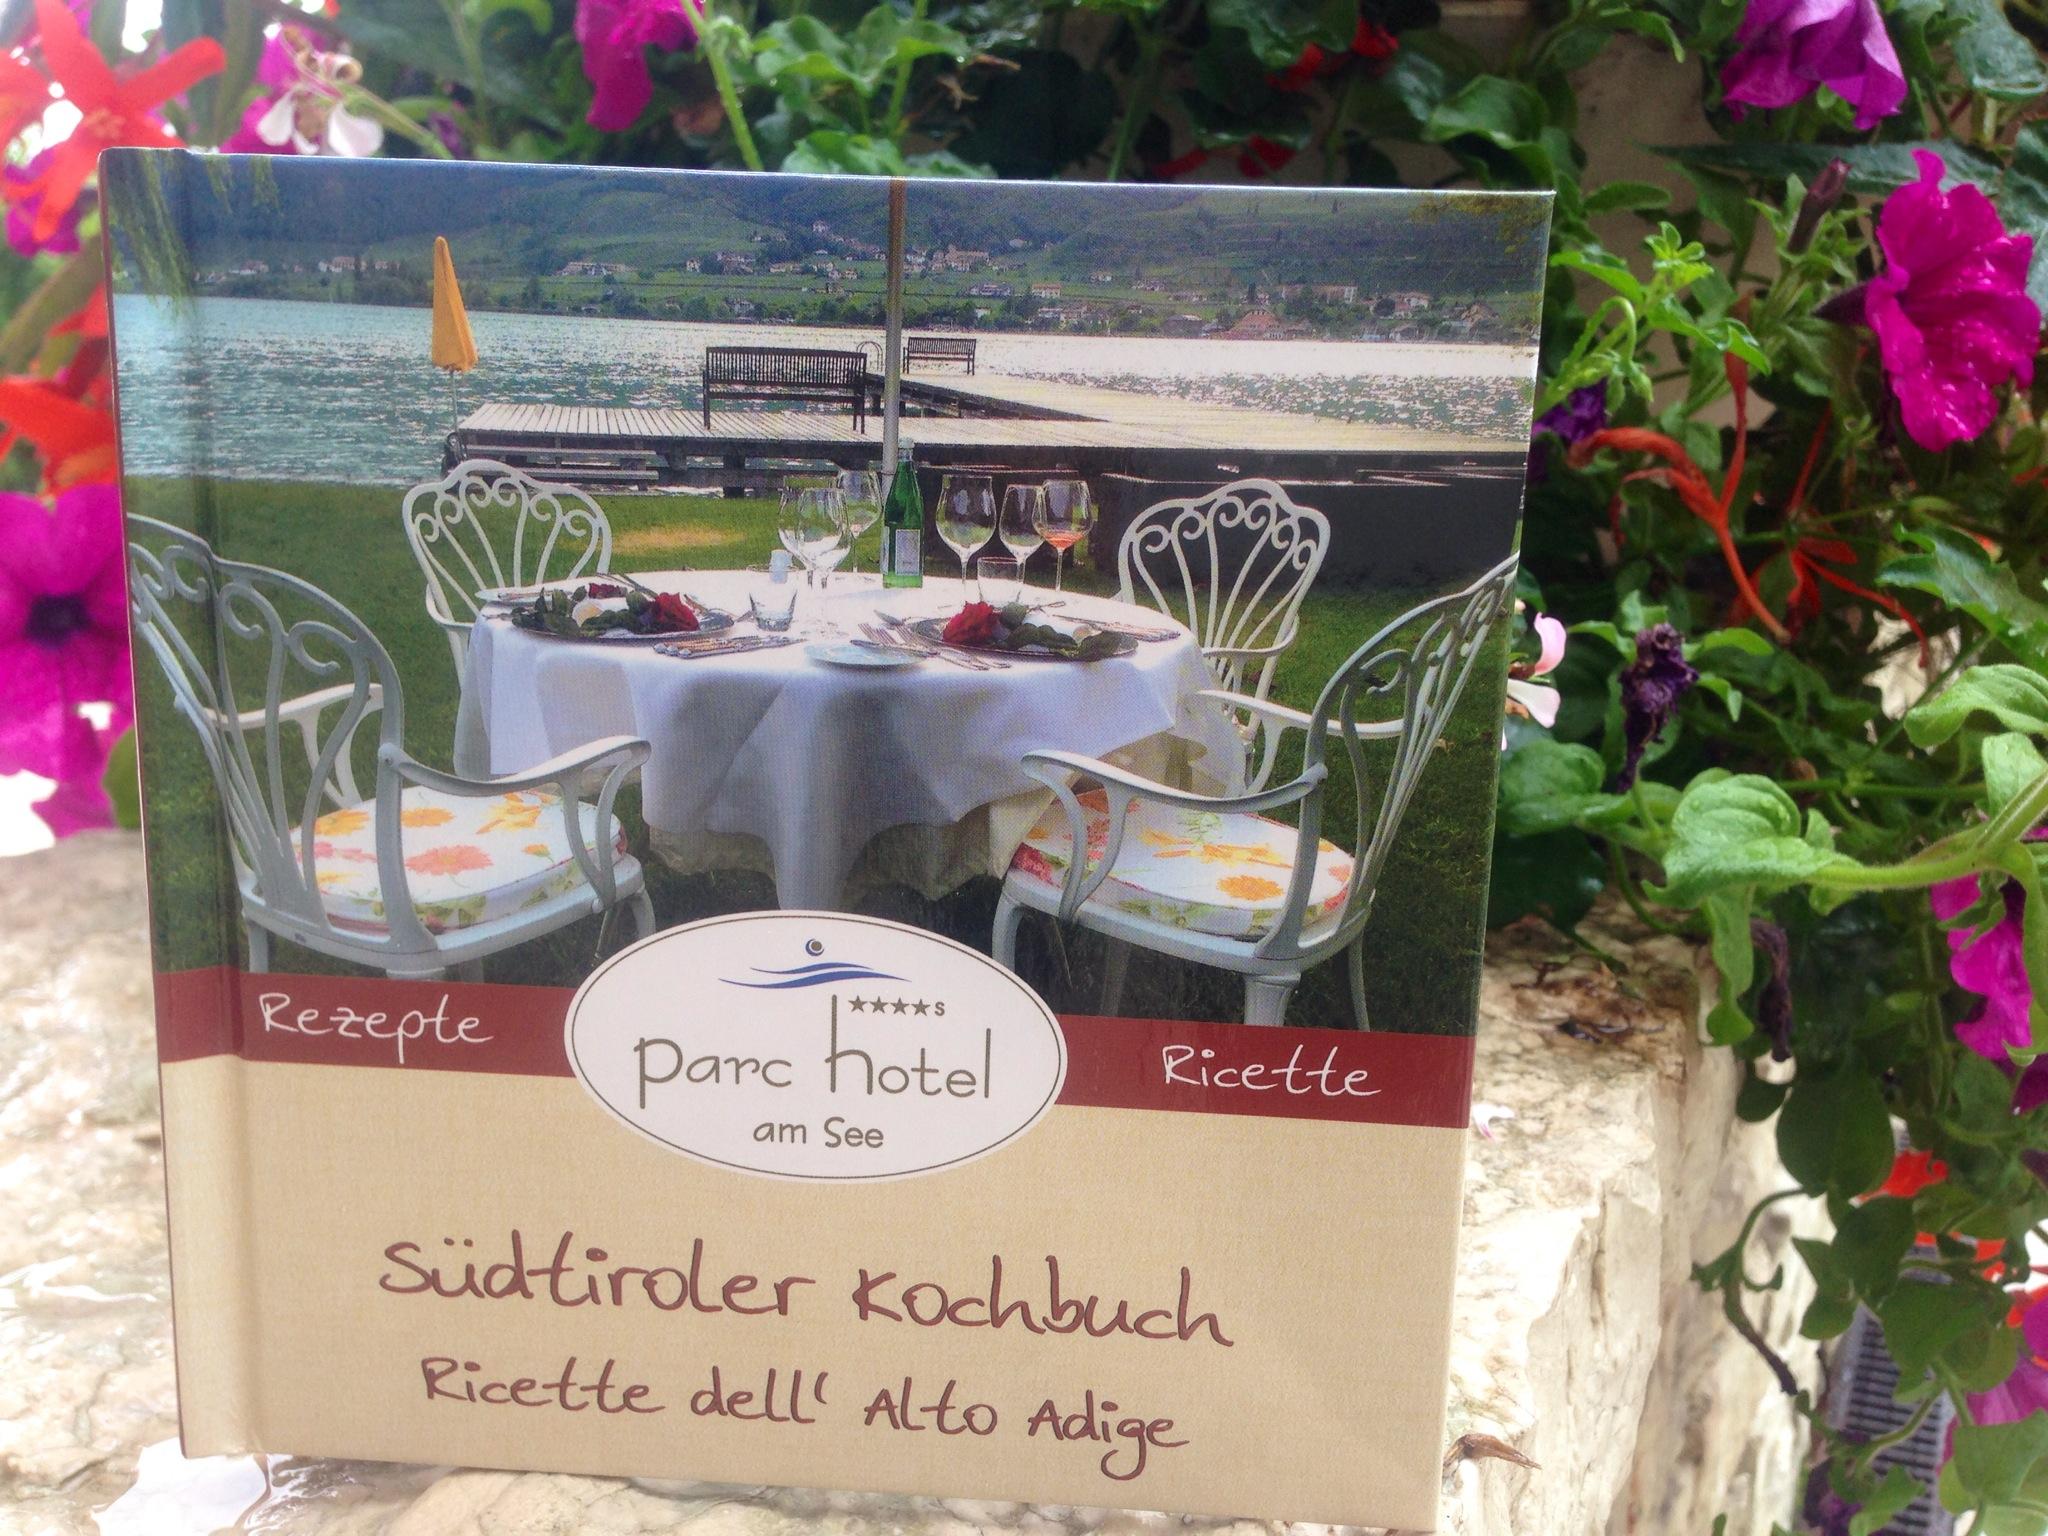 Das Parc Hotel Kochbuch